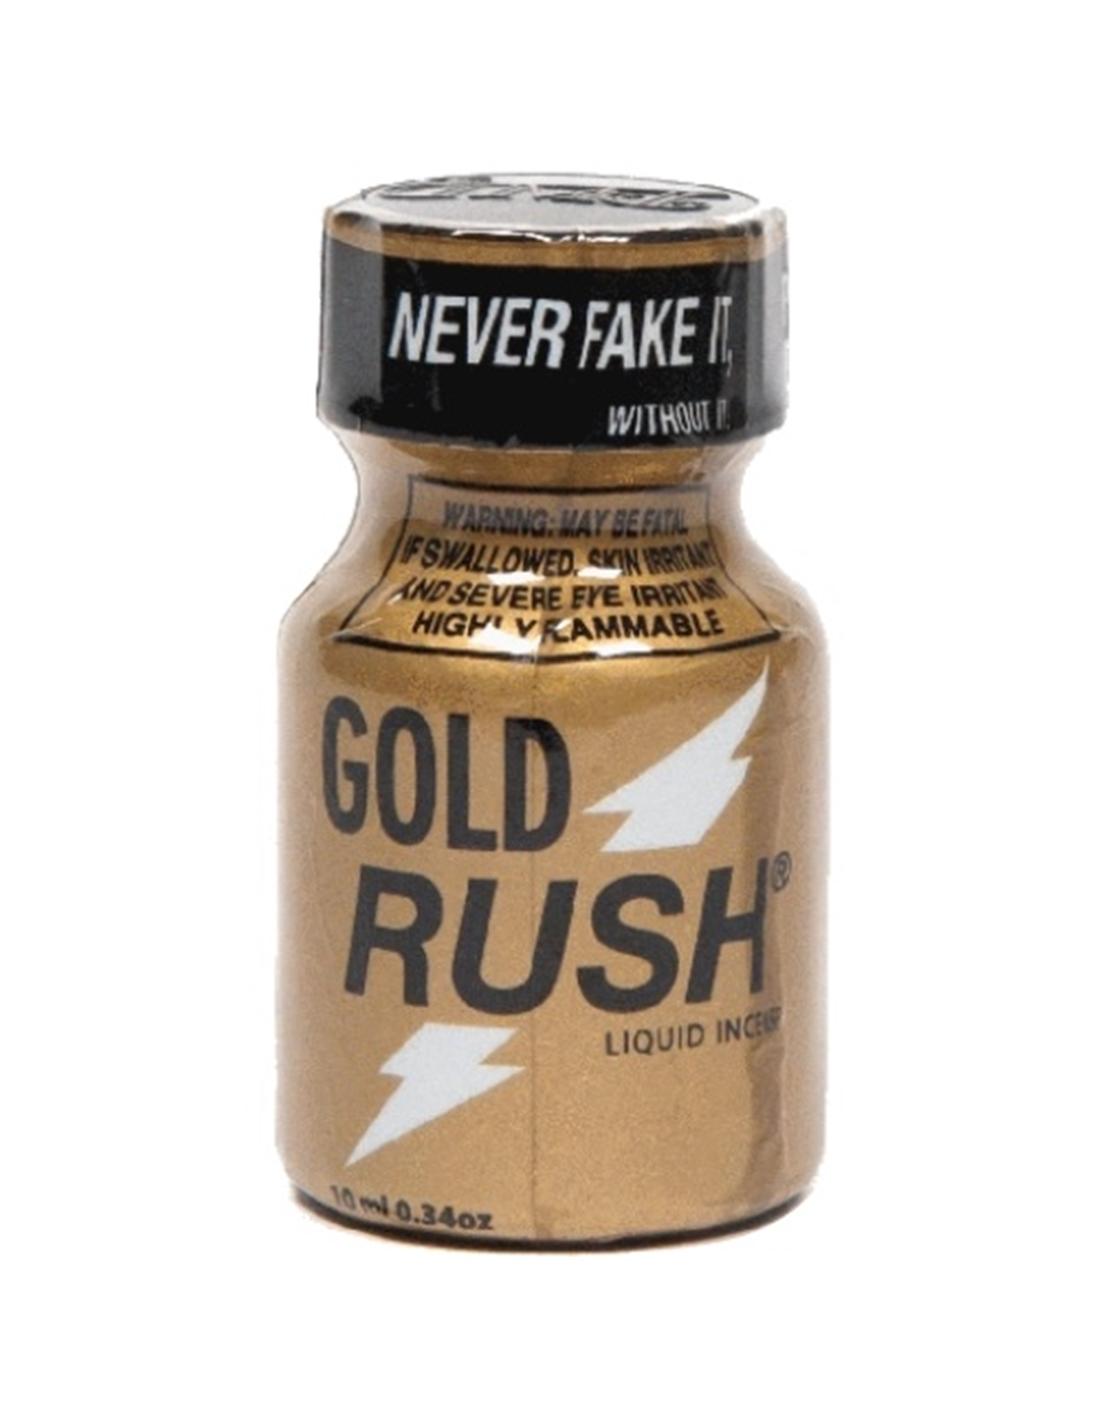 Gold Rush 10ml - PR2010319737